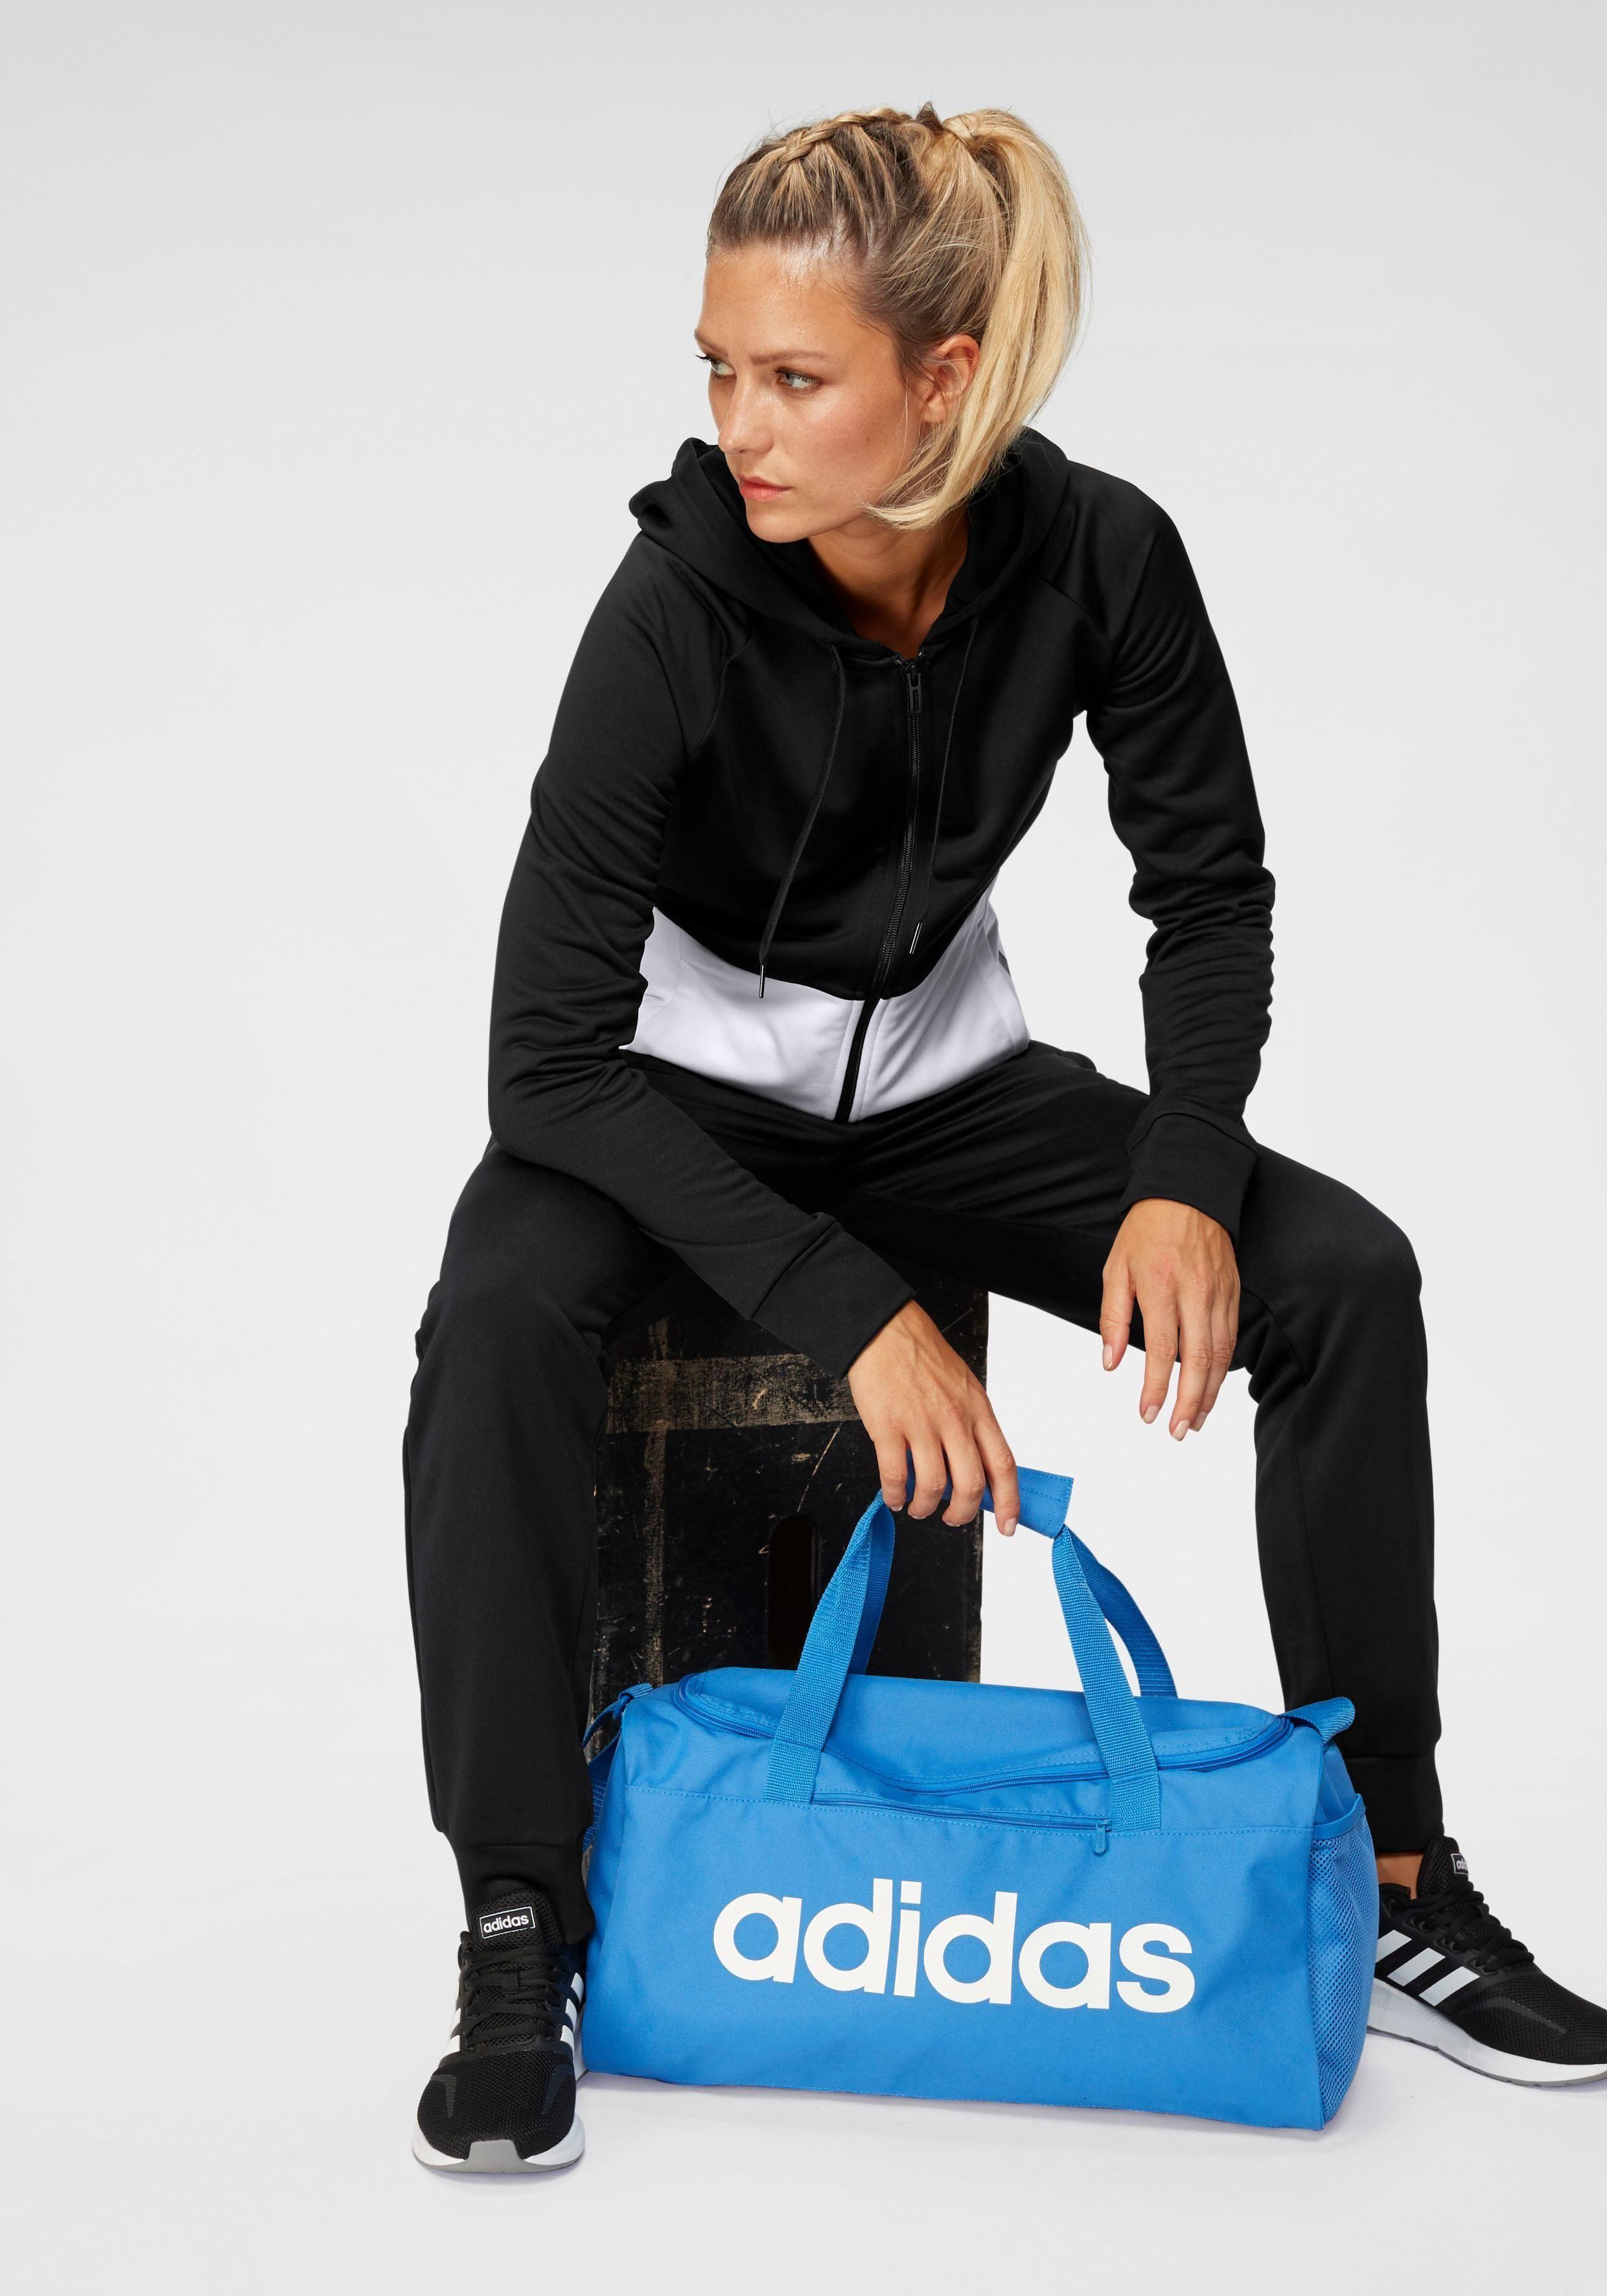 adidas Trainingsanzug »WOMEN TRACKSUIT LINEAR FRENCH TERRY« (Set, 2 tlg) online kaufen | OTTO